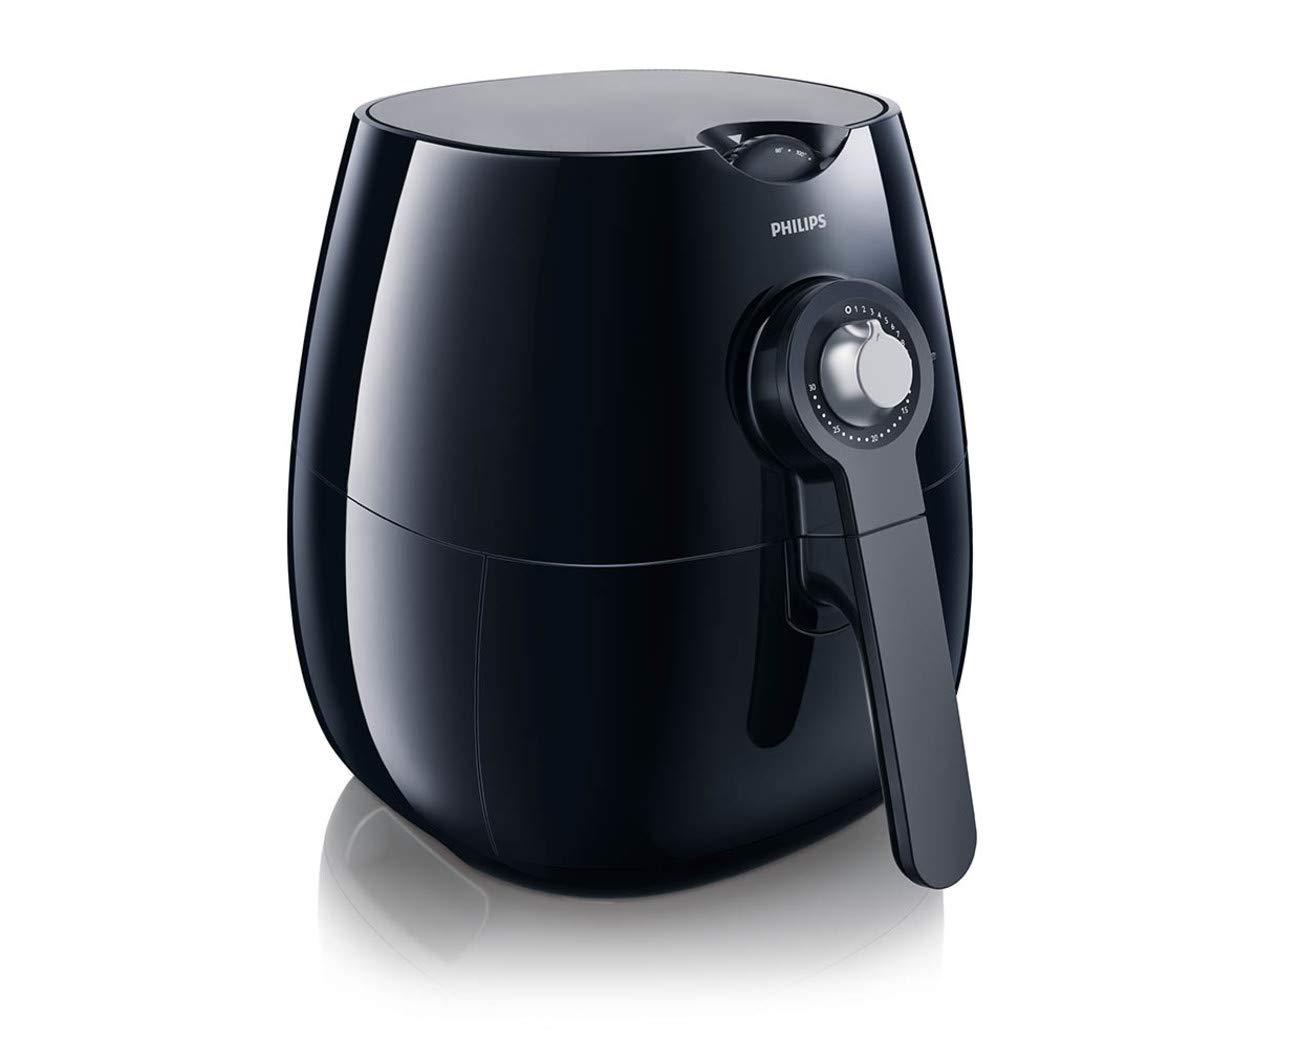 Philips HD9220/29 Airfryer, 1.8lb/2.75qt, Black by Philips Kitchen Appliances